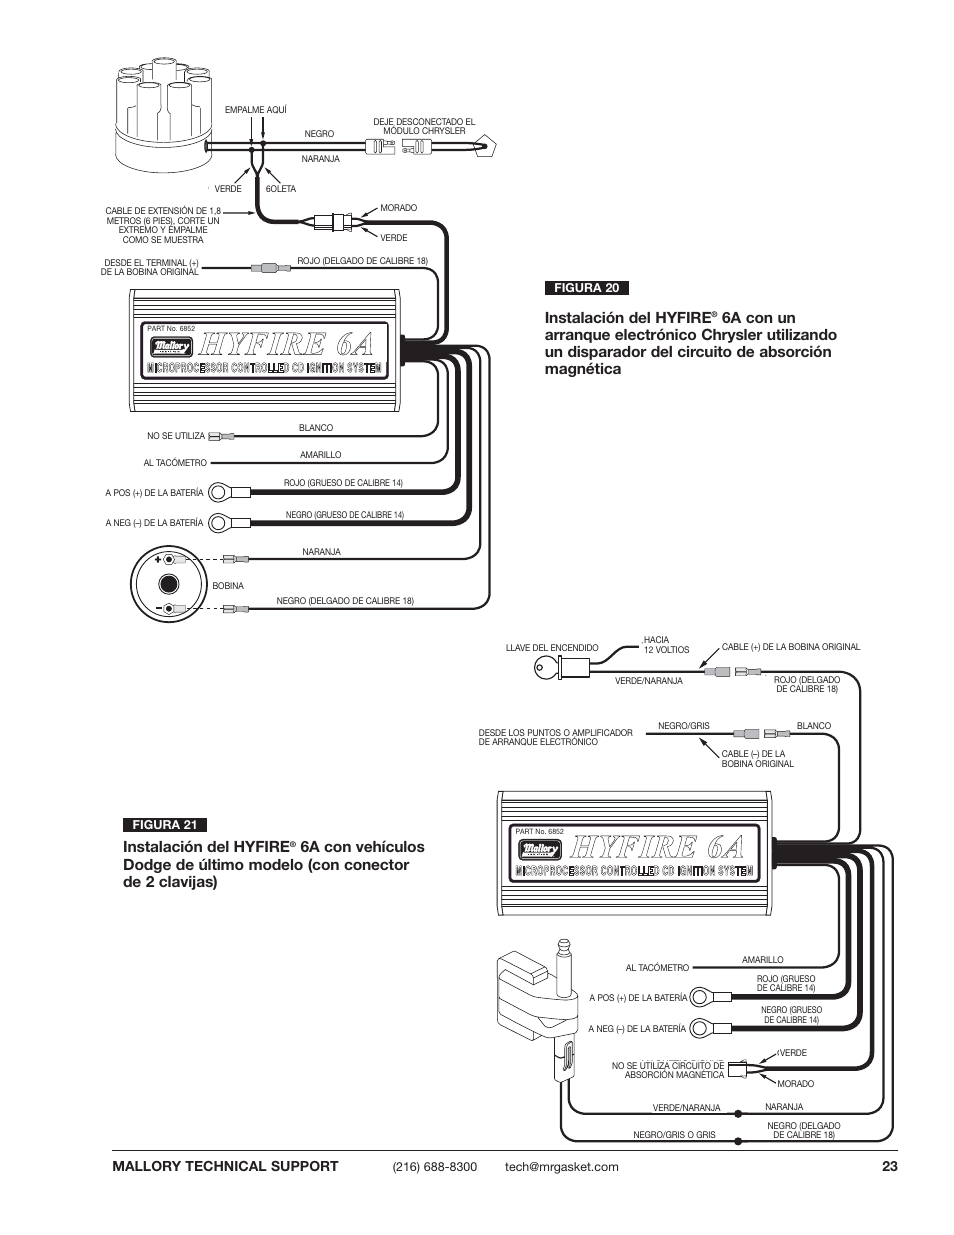 mallory wiring diagram 607 wiring diagram rh vw35 vom winnenthal de